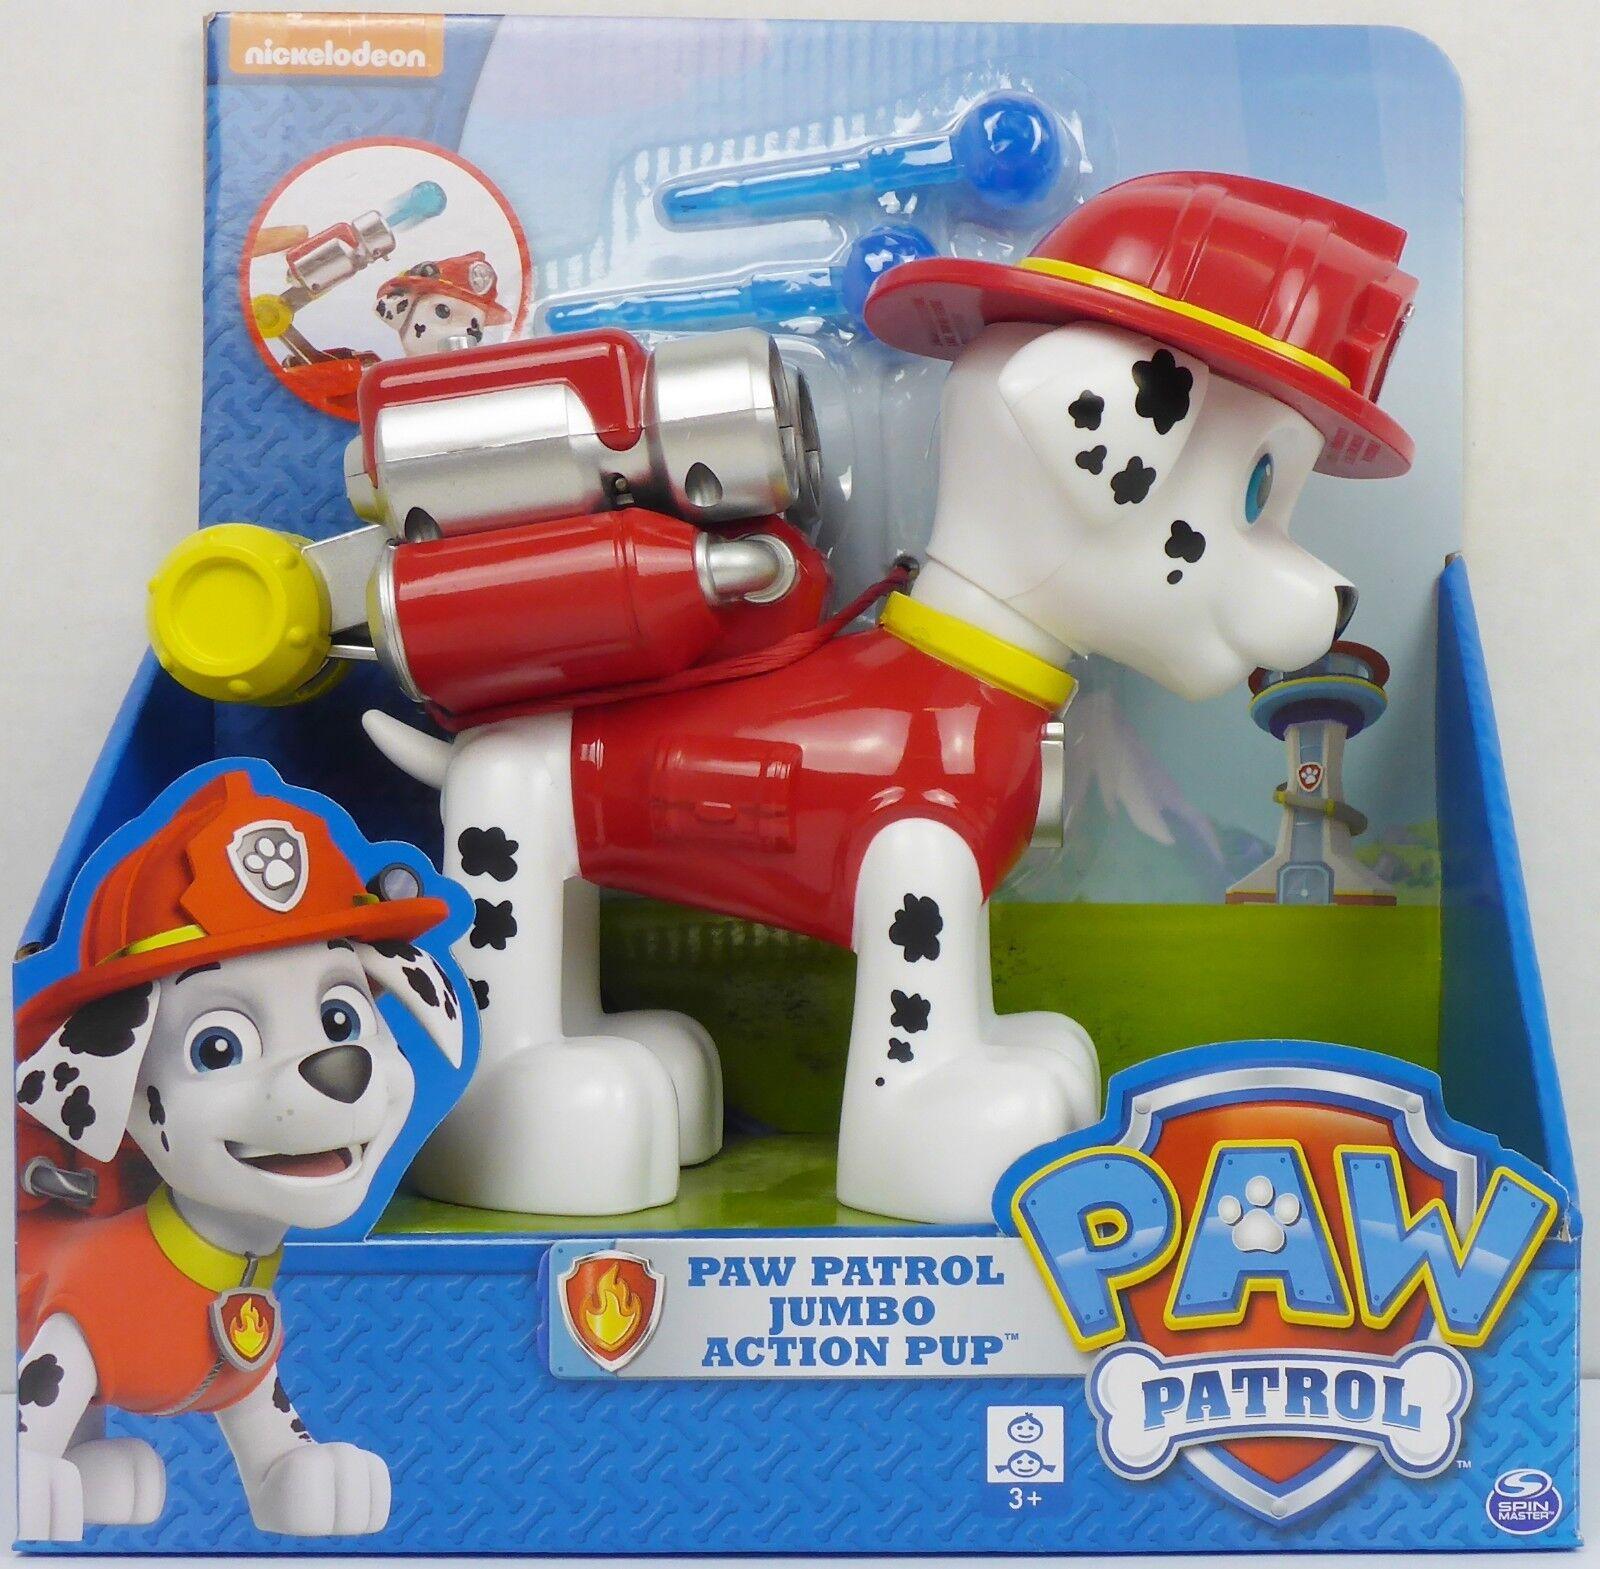 Paw Patrol Jumbo Action Pup Marshall Figur ca. 15cm groß